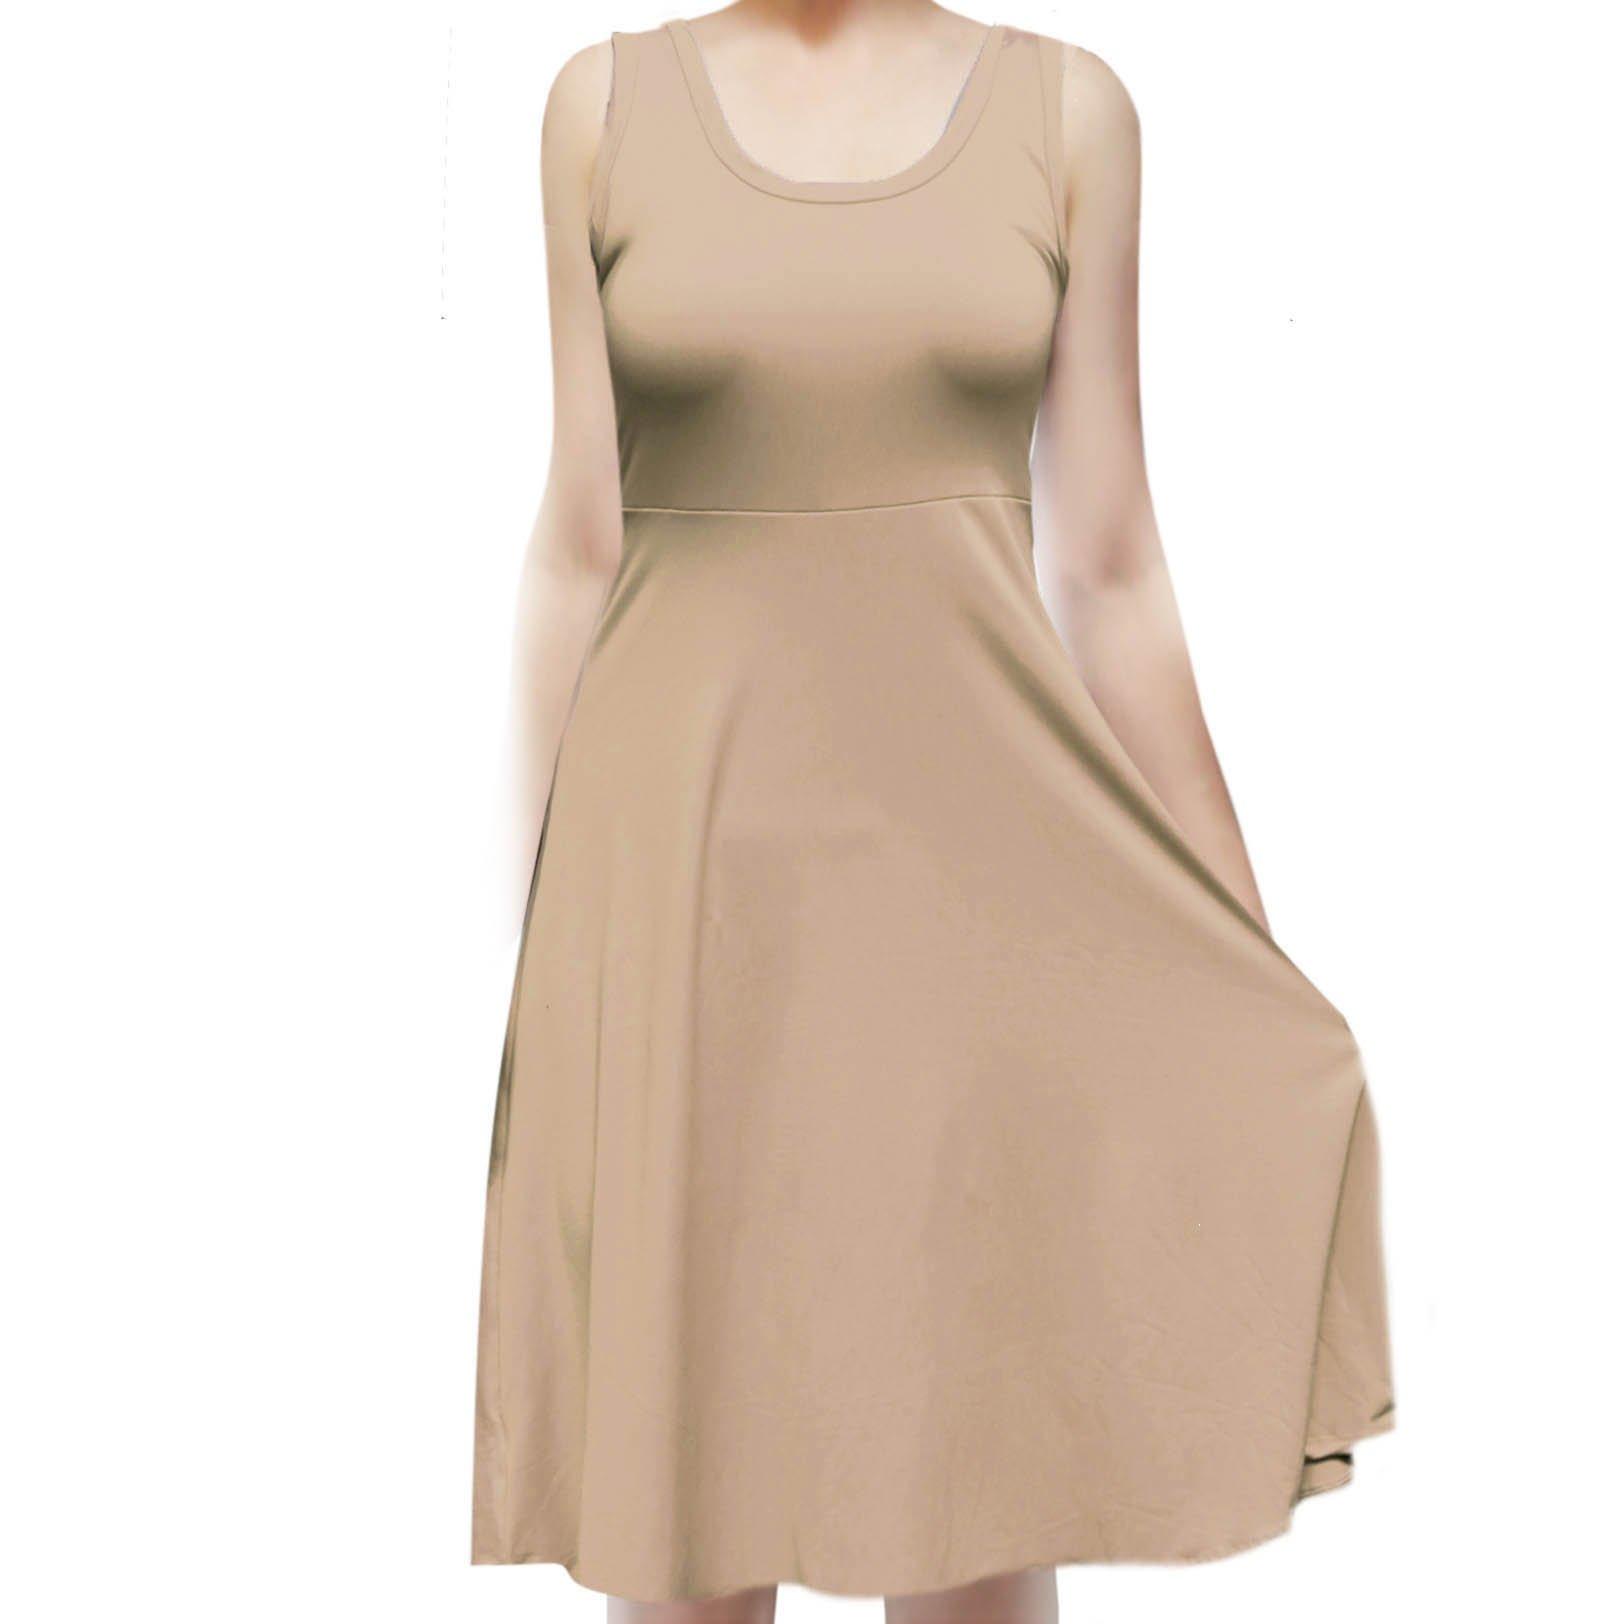 SMT Women's Sleeveless Flowy Midi Summer Beach A Line Tank Dress Tan Medium